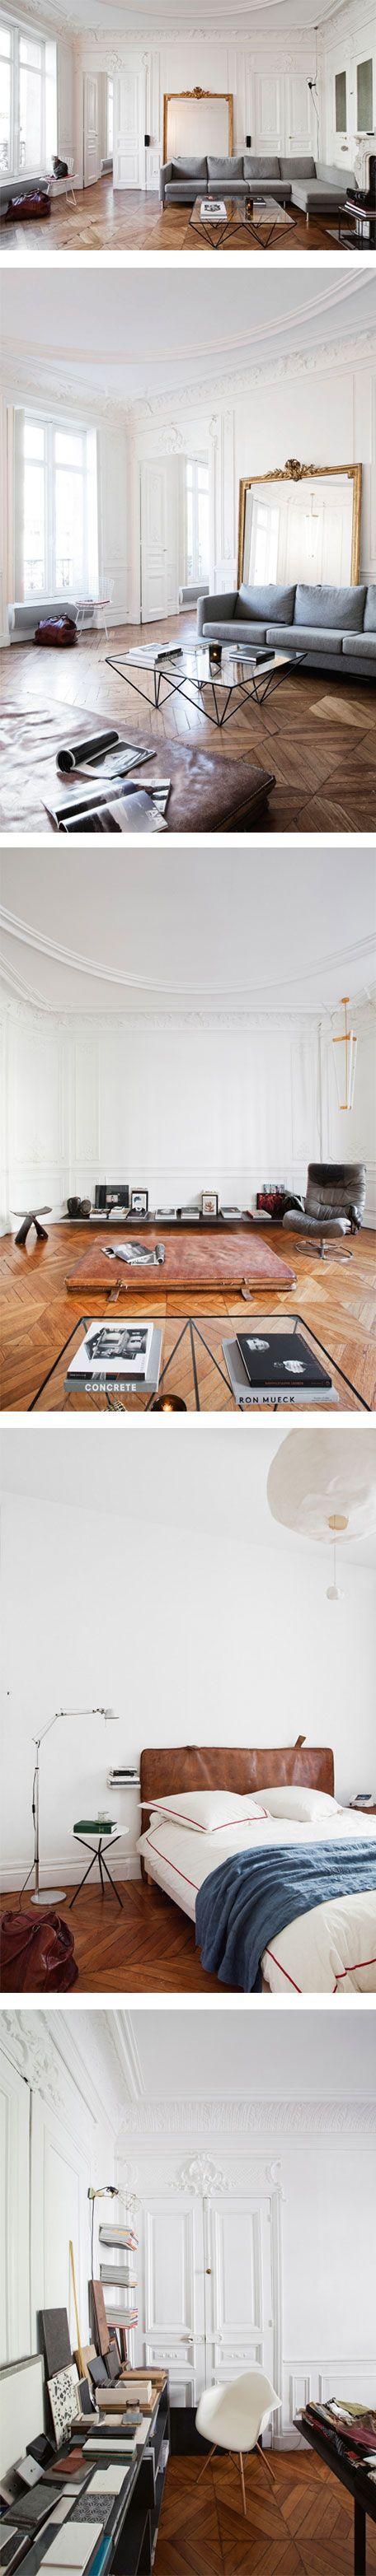 A dreamy 19th-century apartment in Paris